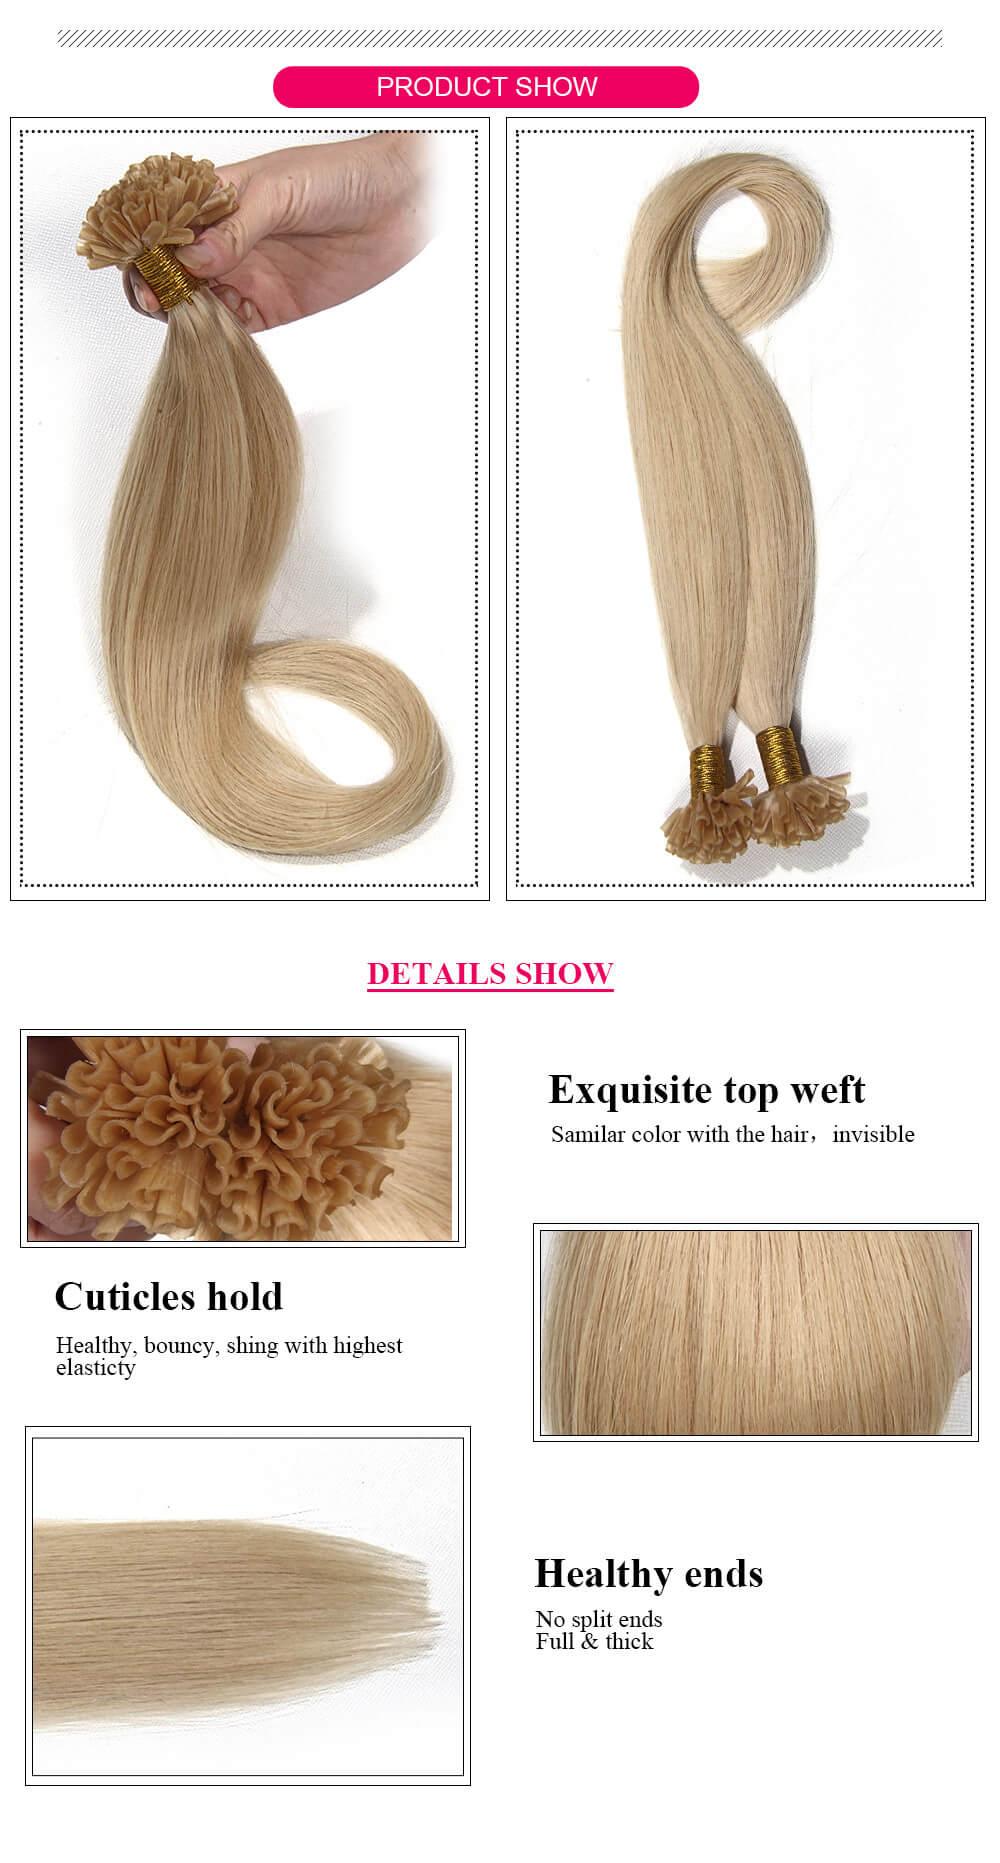 U Tip hair 613# product details